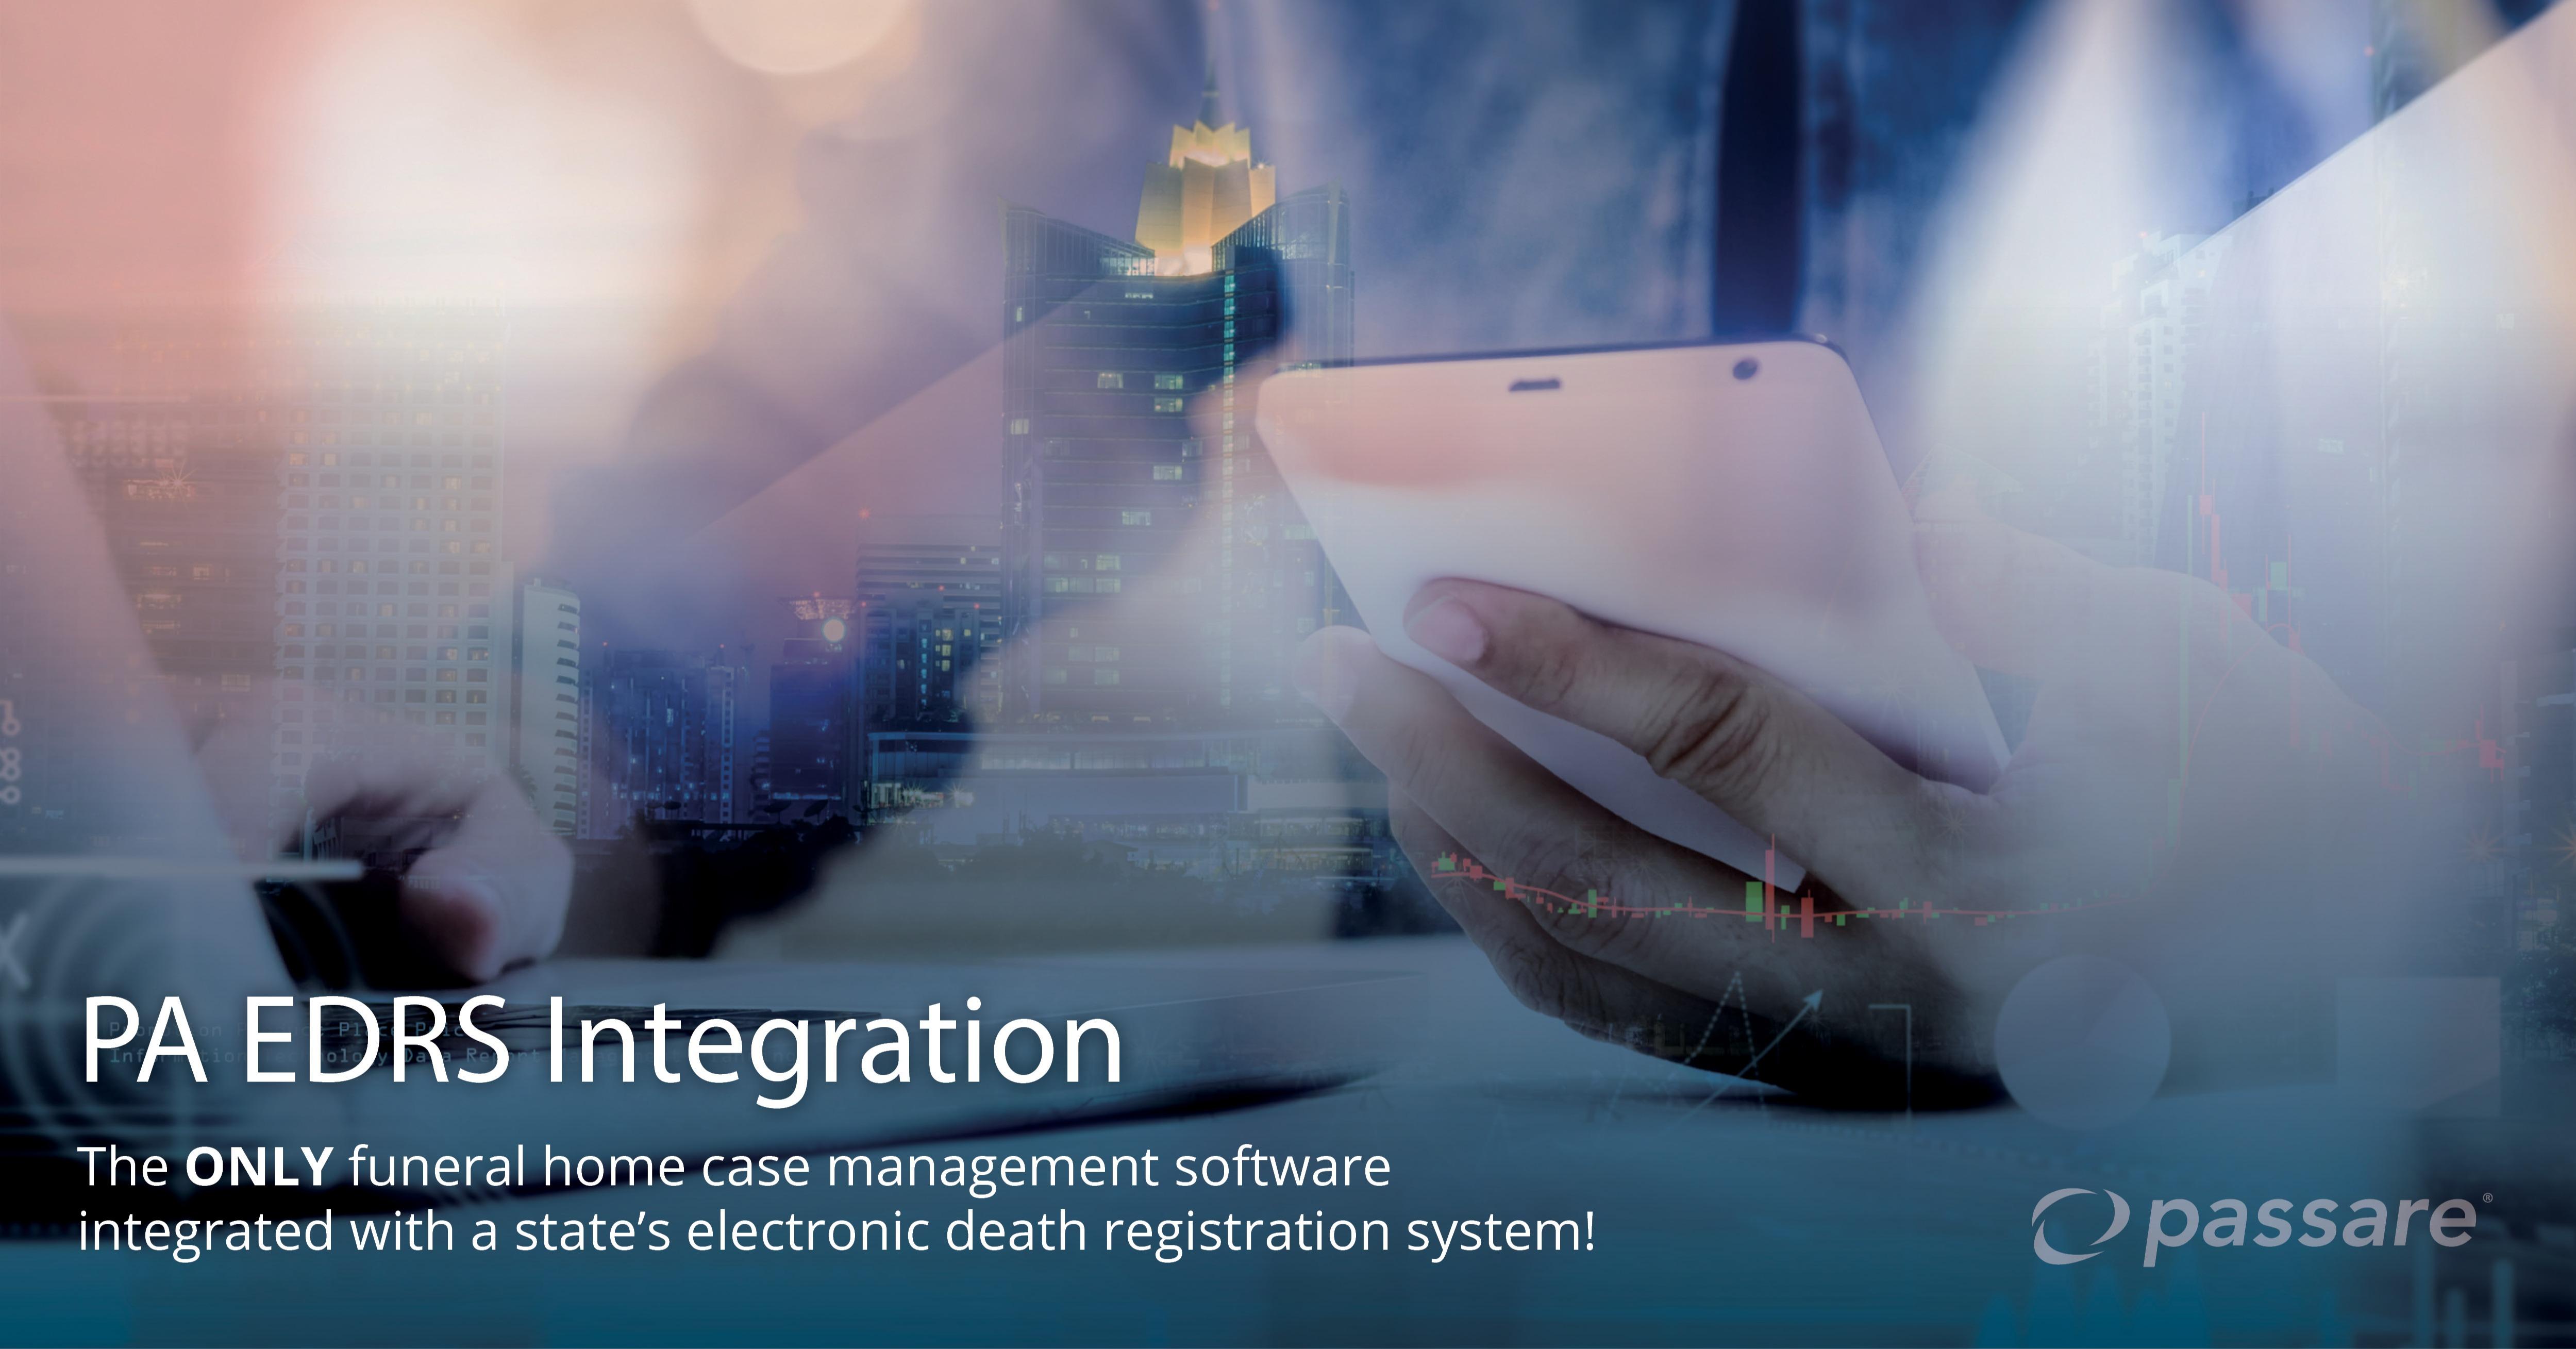 Passare Wins 2021 NFDA Innovation Award for Groundbreaking Integration